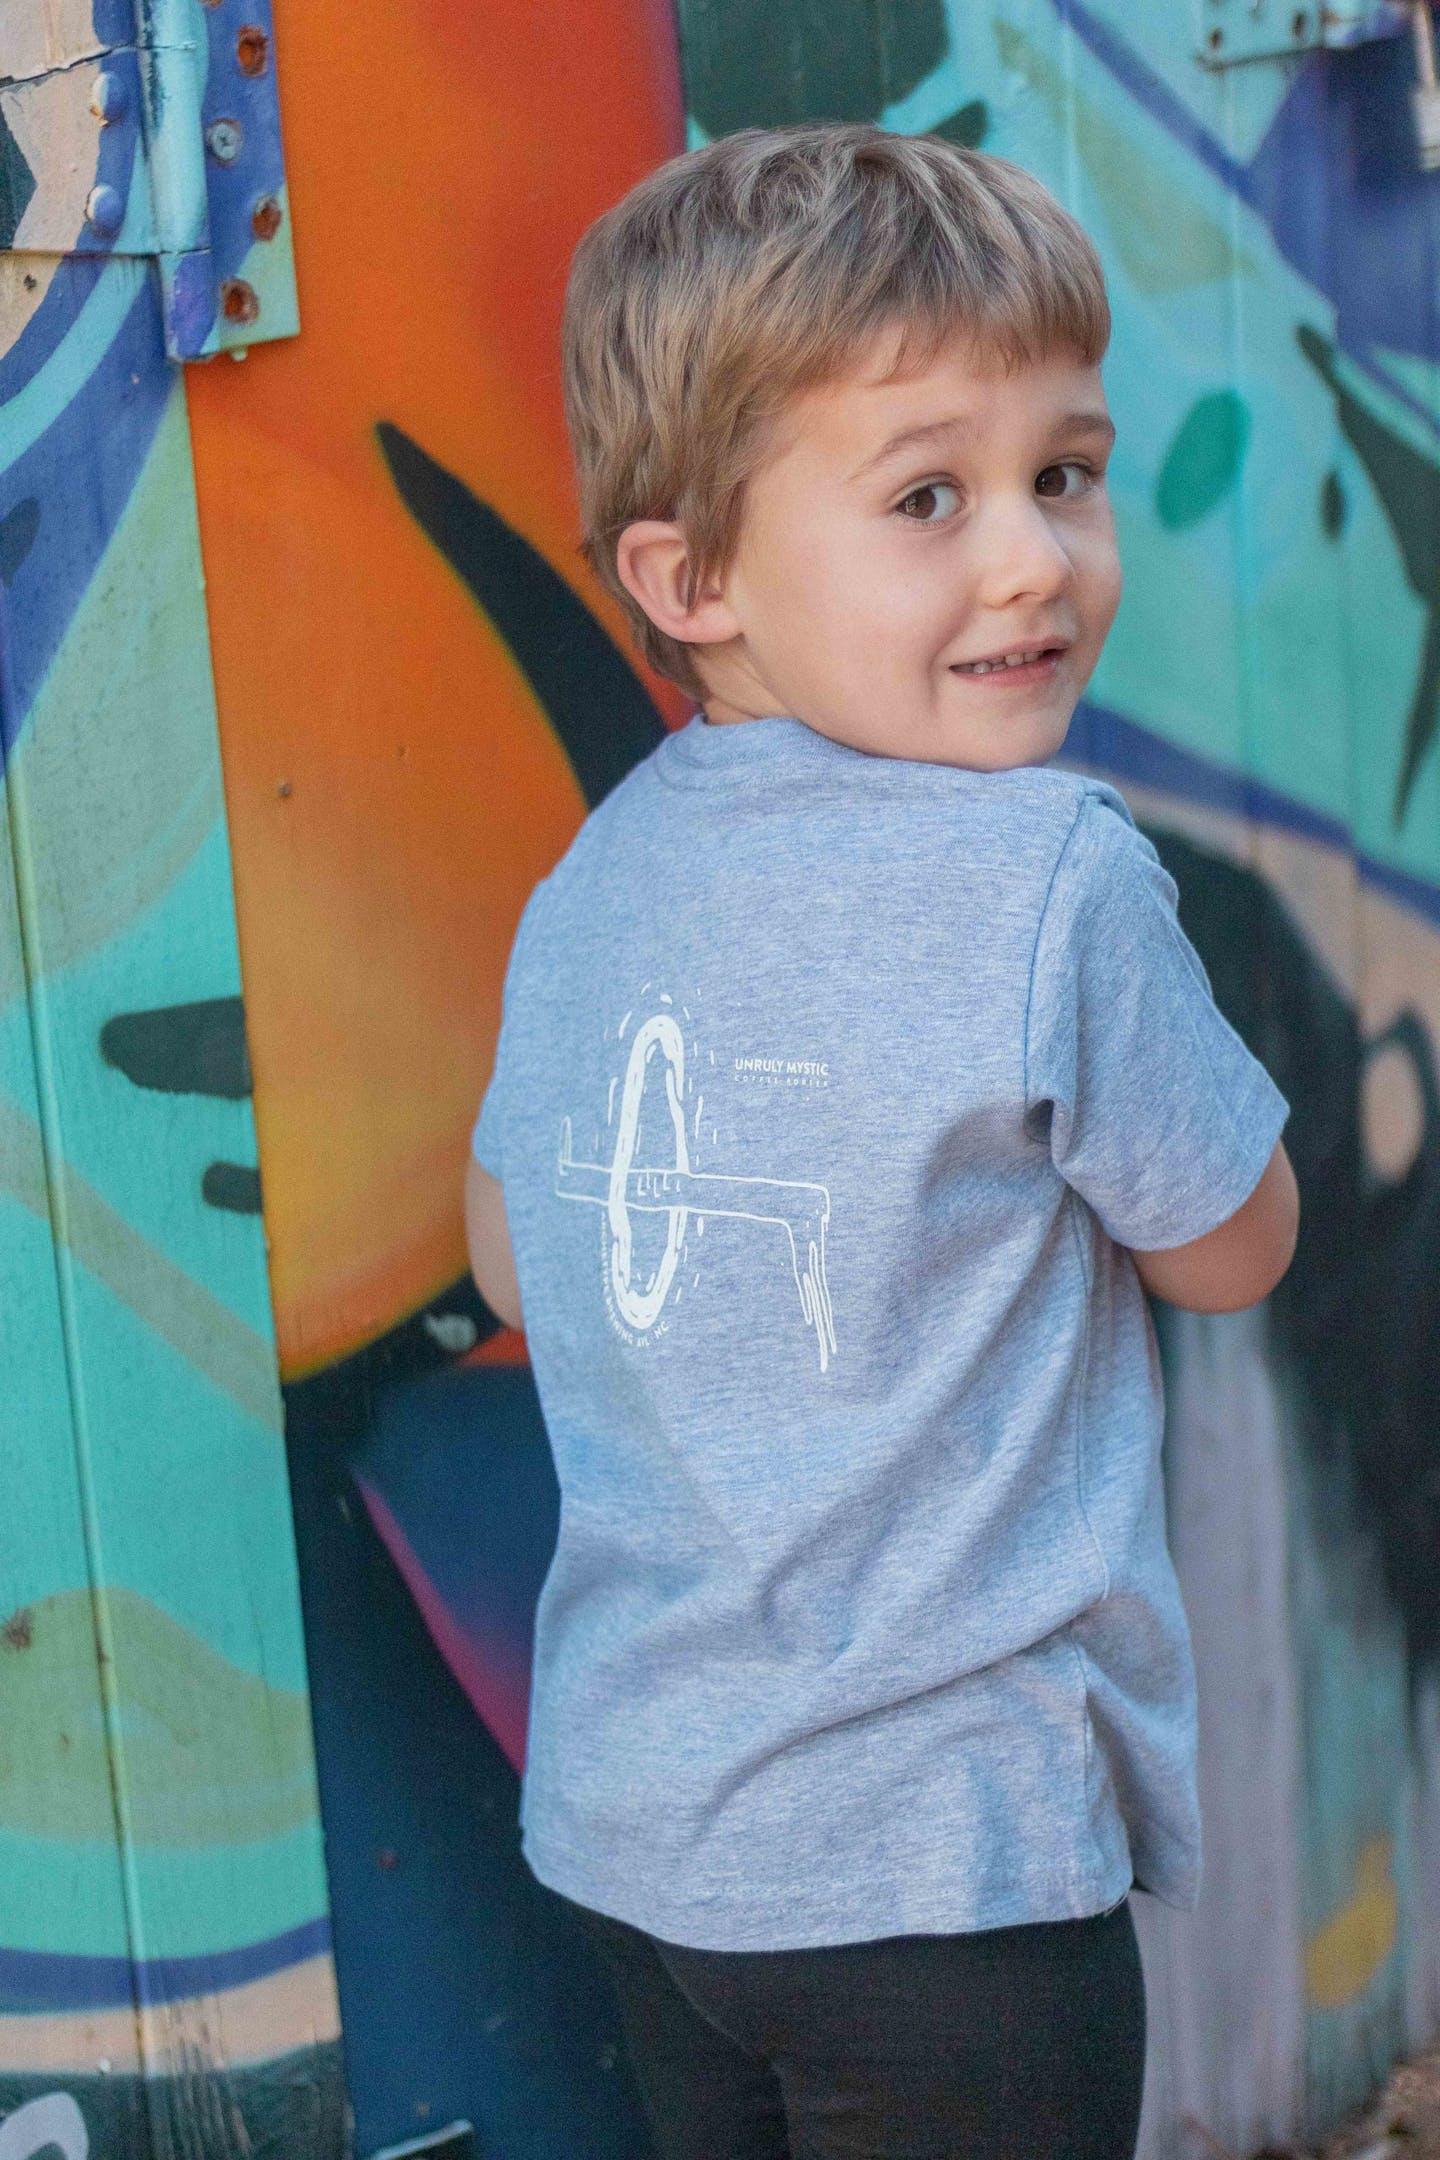 2020_Kids Shirt Inventory_ Carlos Maldonado Romero - 12